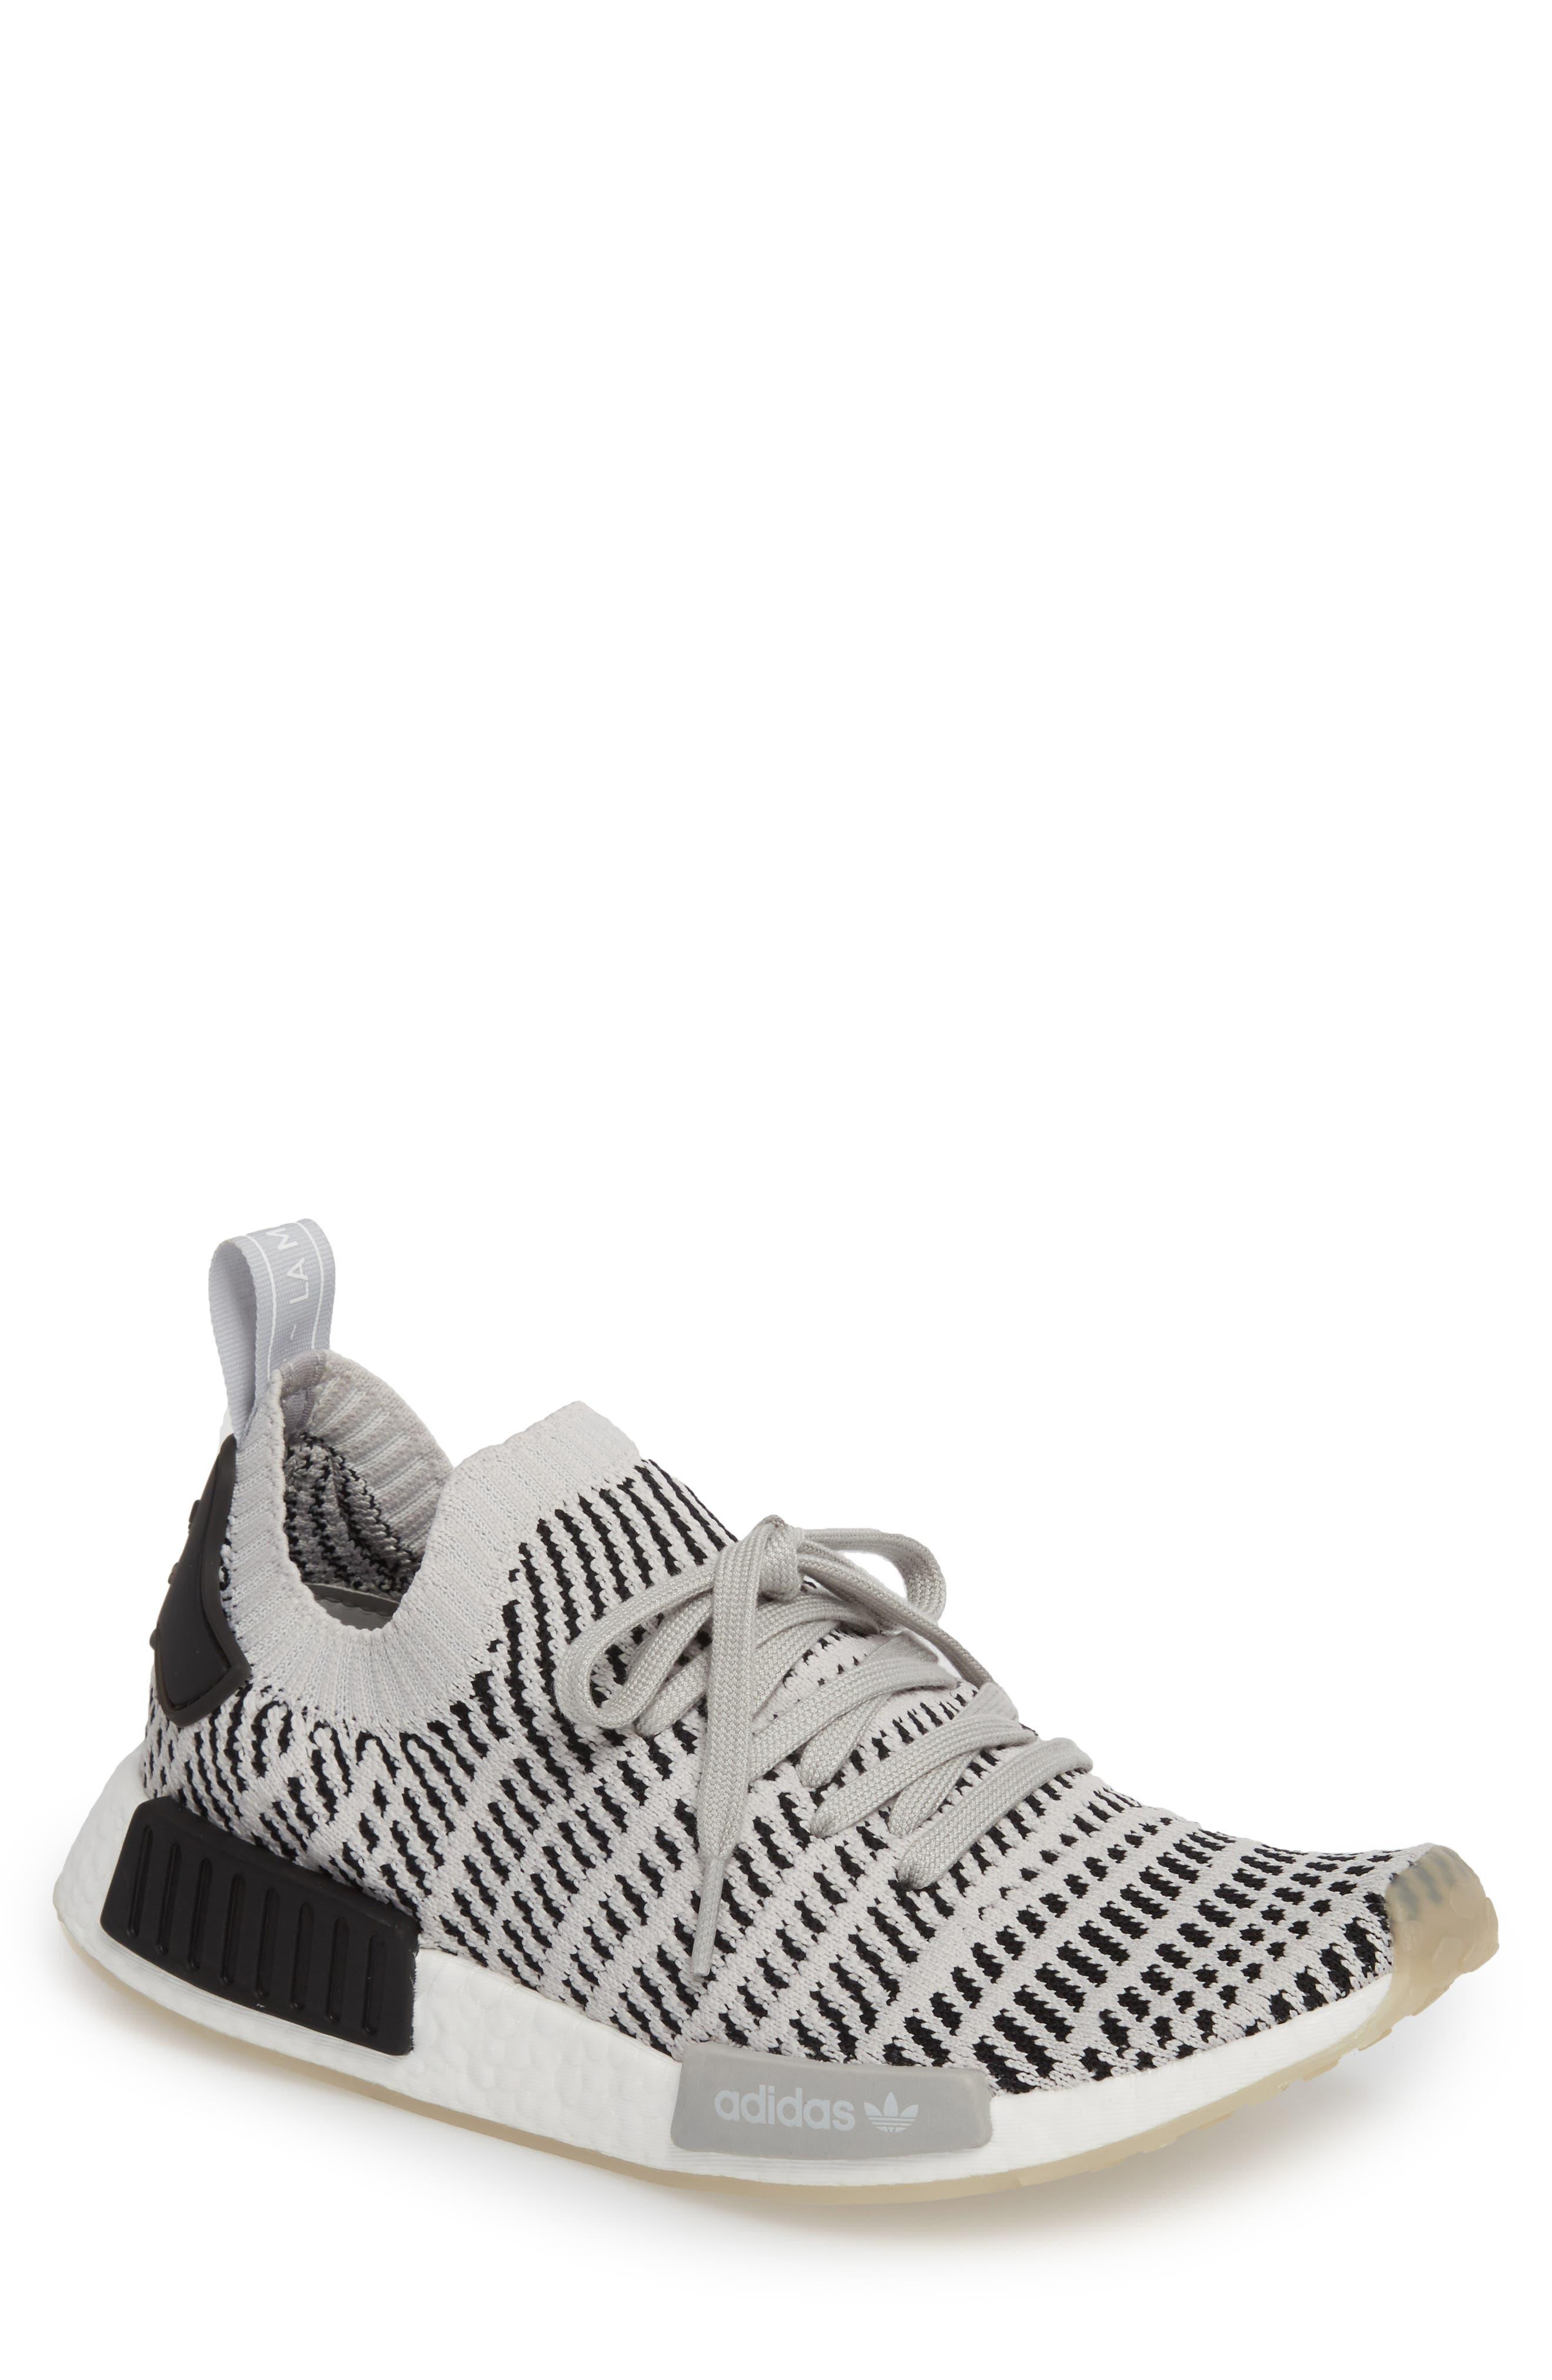 NMD R1 STLT Primeknit Sneaker,                         Main,                         color, Grey/ Core Black